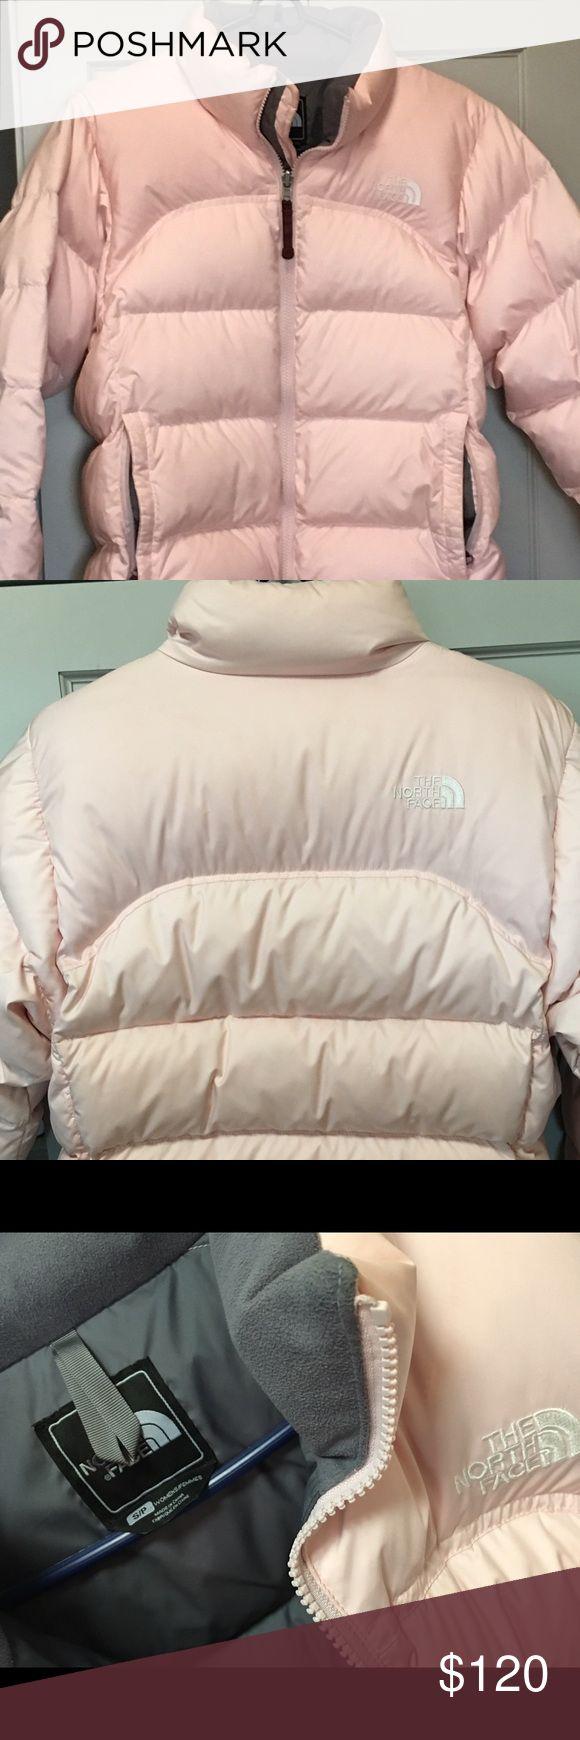 Like new North-face 700 winter coat Beautiful light pink Like new condition North Face 700 Winter Coat!  So warm! North Face Jackets & Coats Puffers